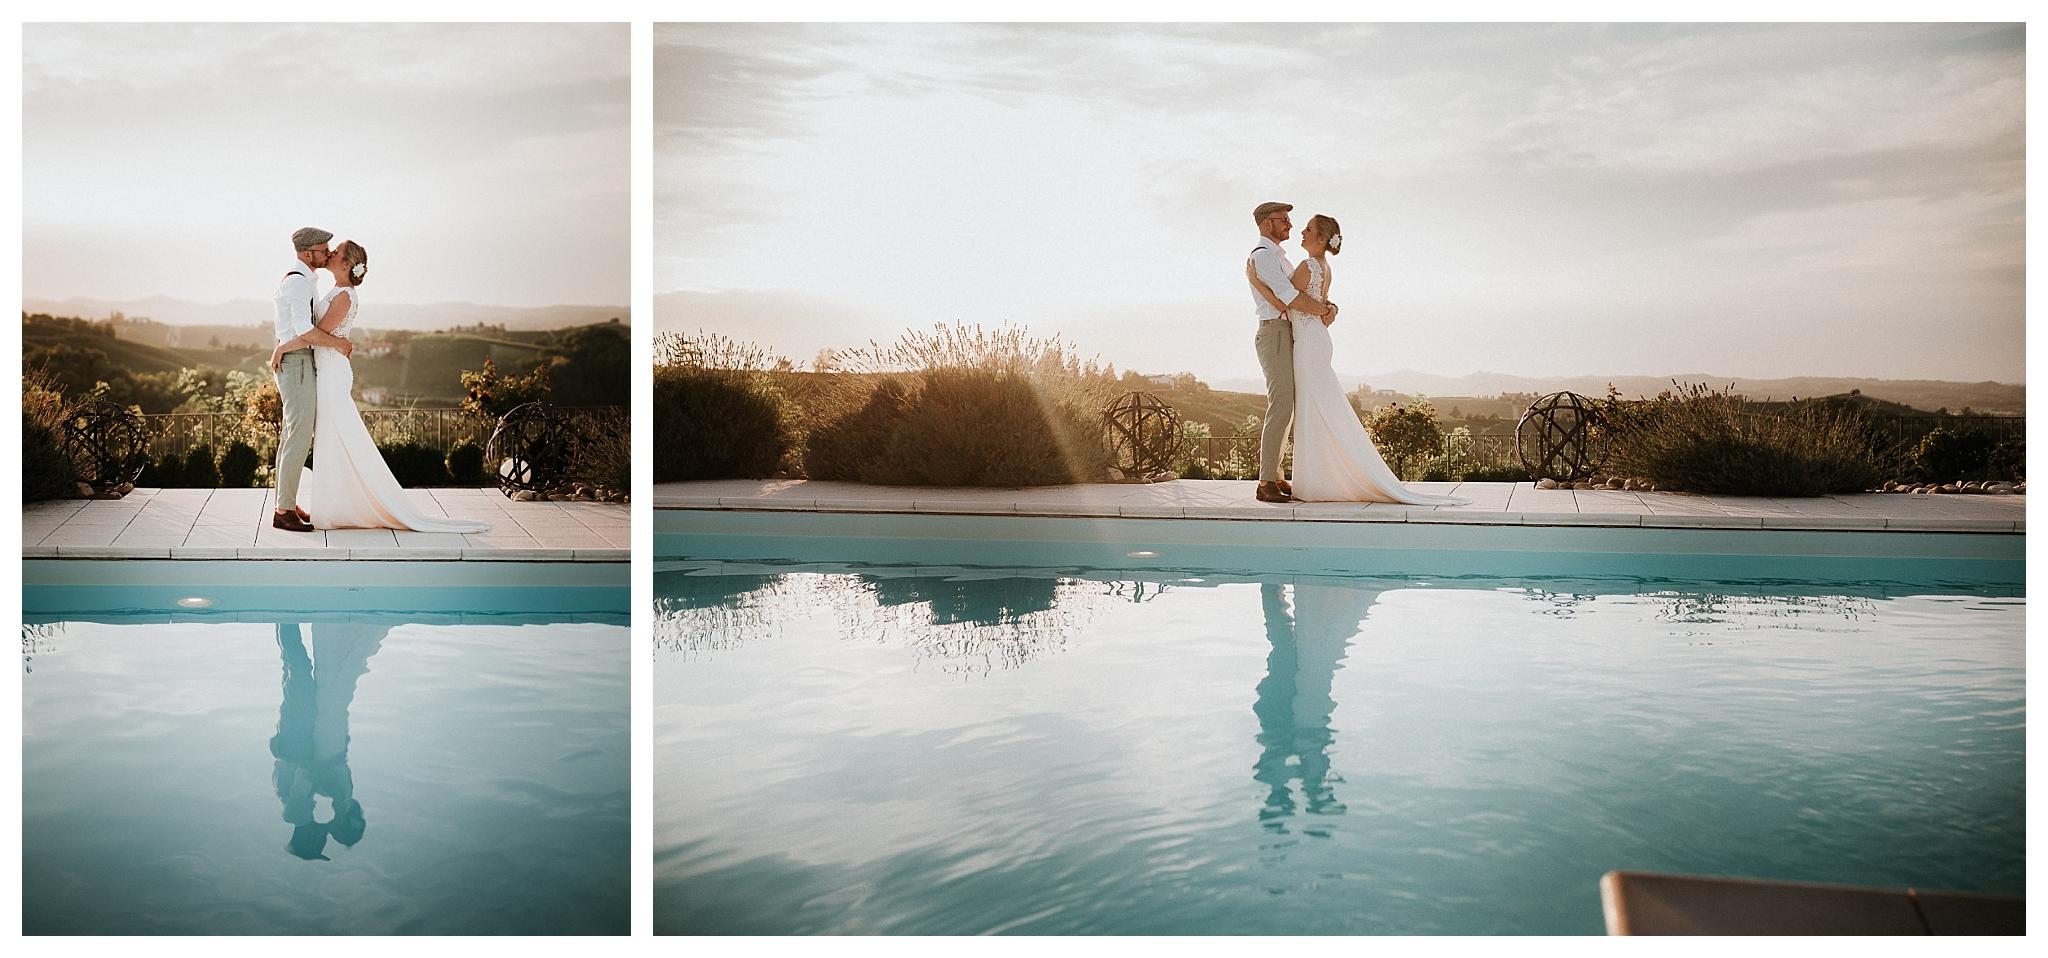 wedding photography by the pool at La Villa Hotel, Mombaruzzo